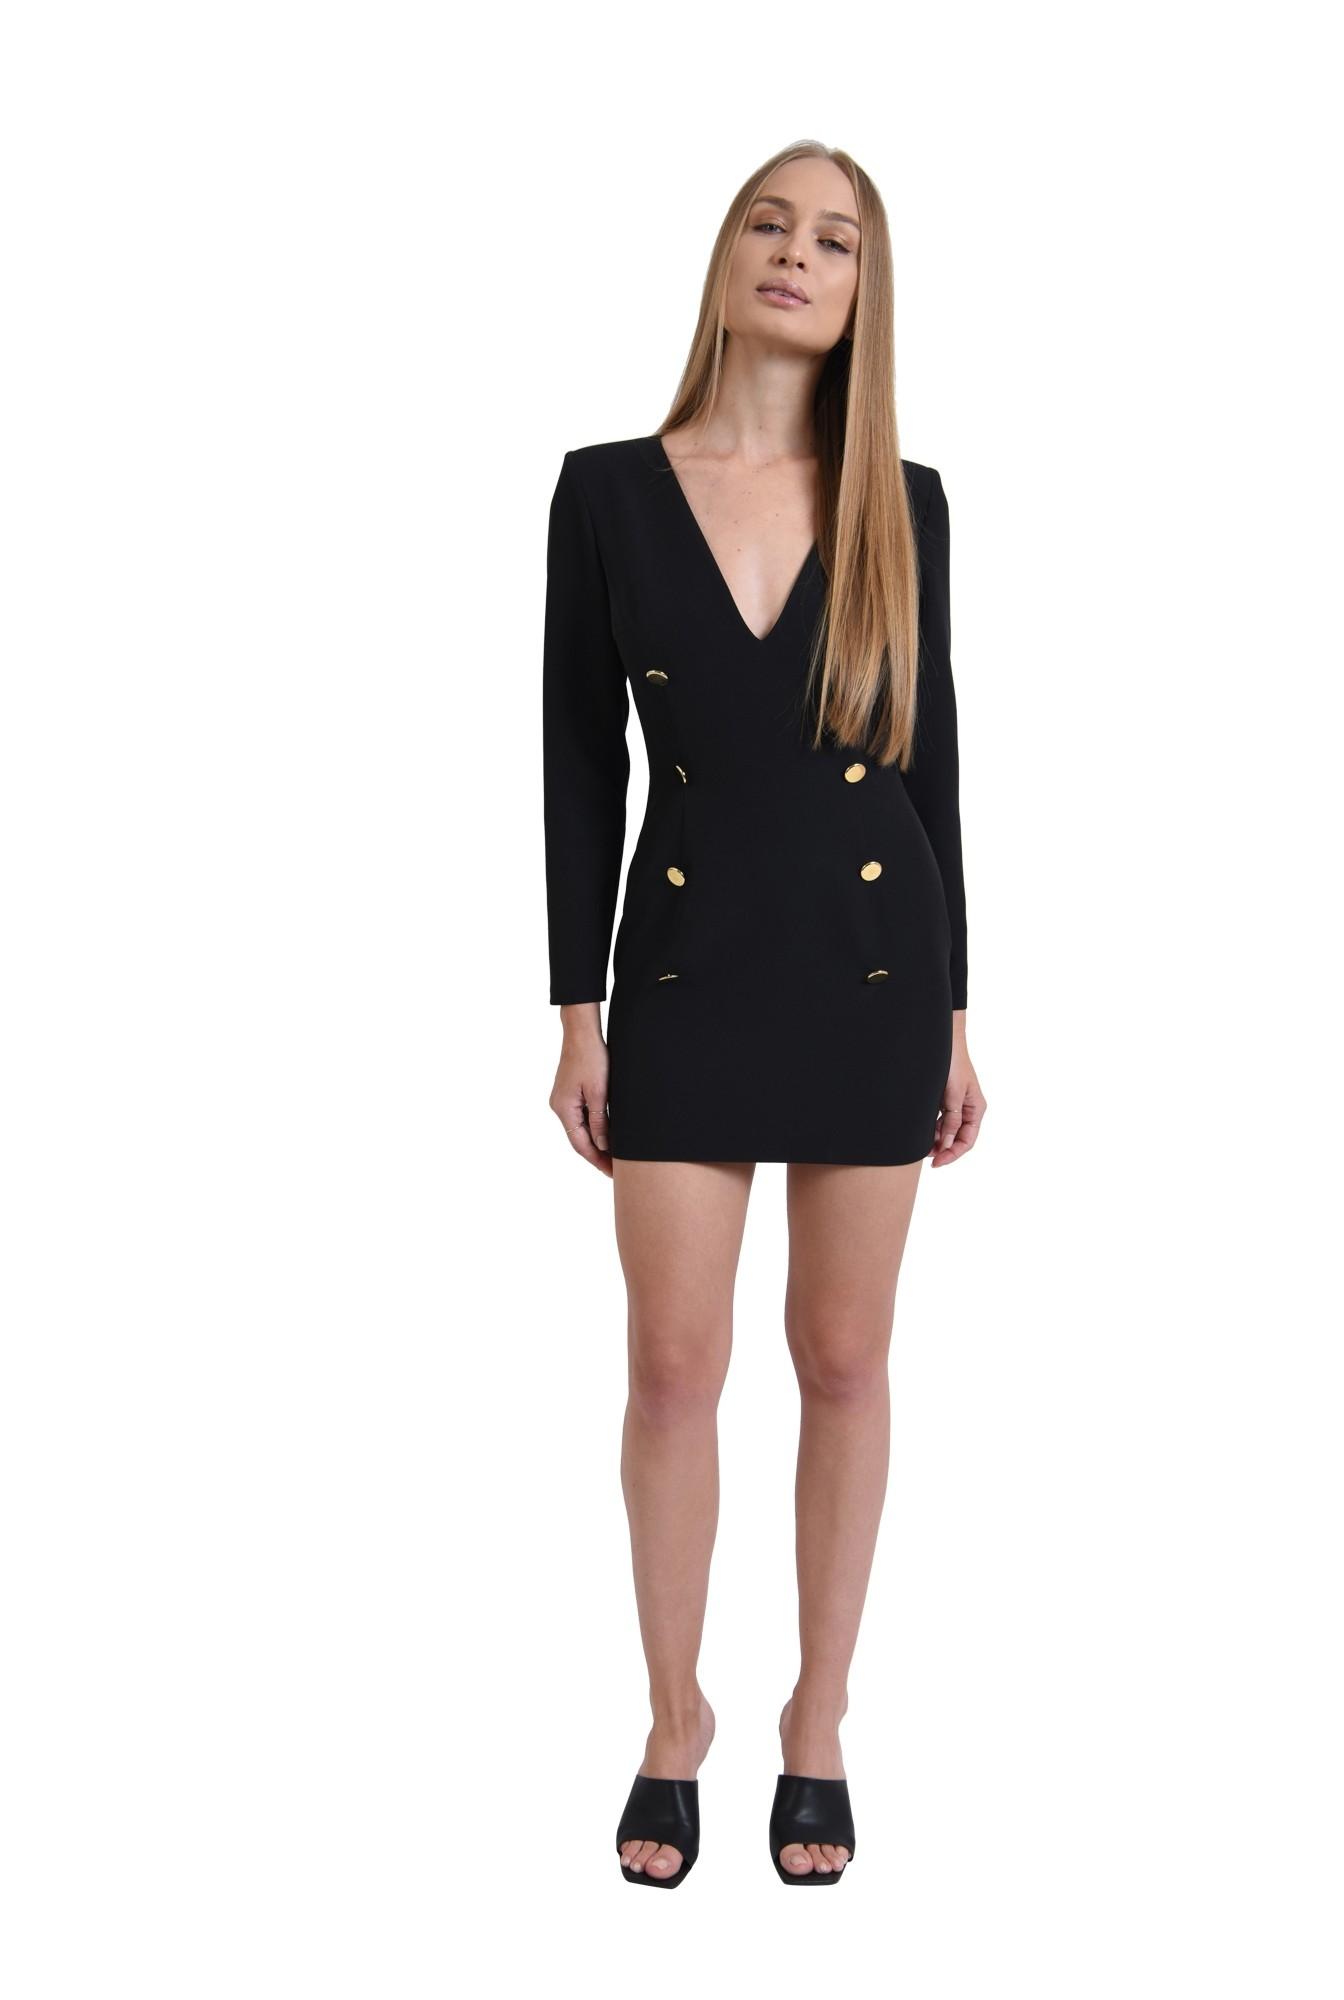 3 - rochie casual, neagra, cu nasturi multipli